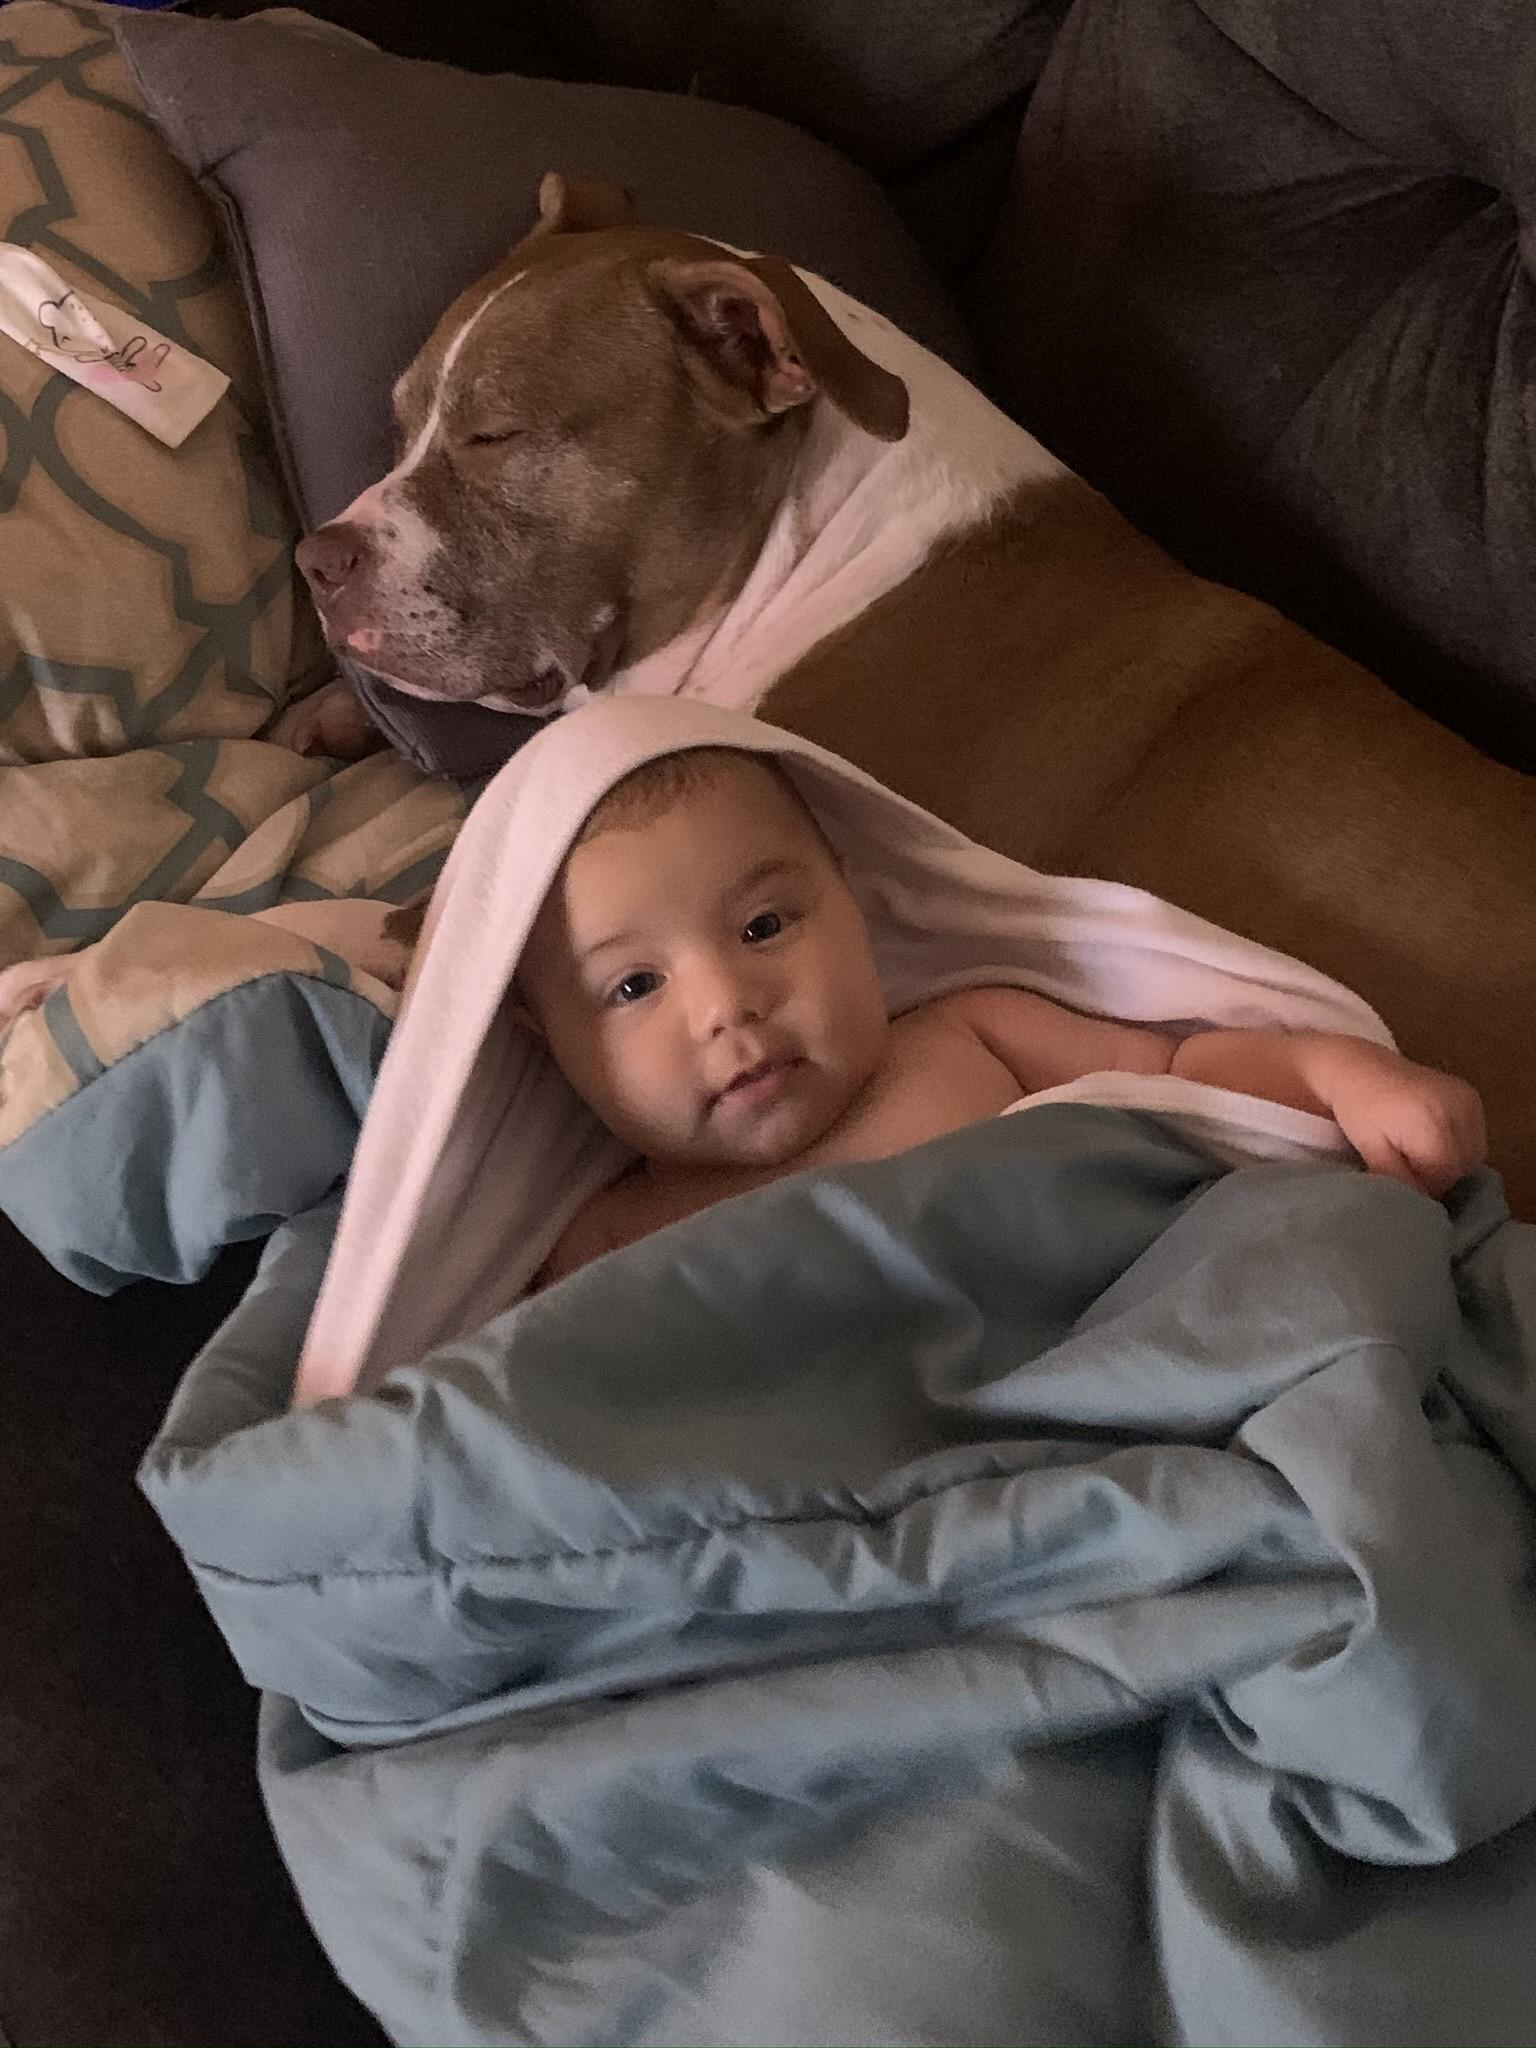 Newborn Baby Pitbulls : newborn, pitbulls, Pictures, Hate,, Trust, Pitbull, Newborn, Other, People, Pitbulls